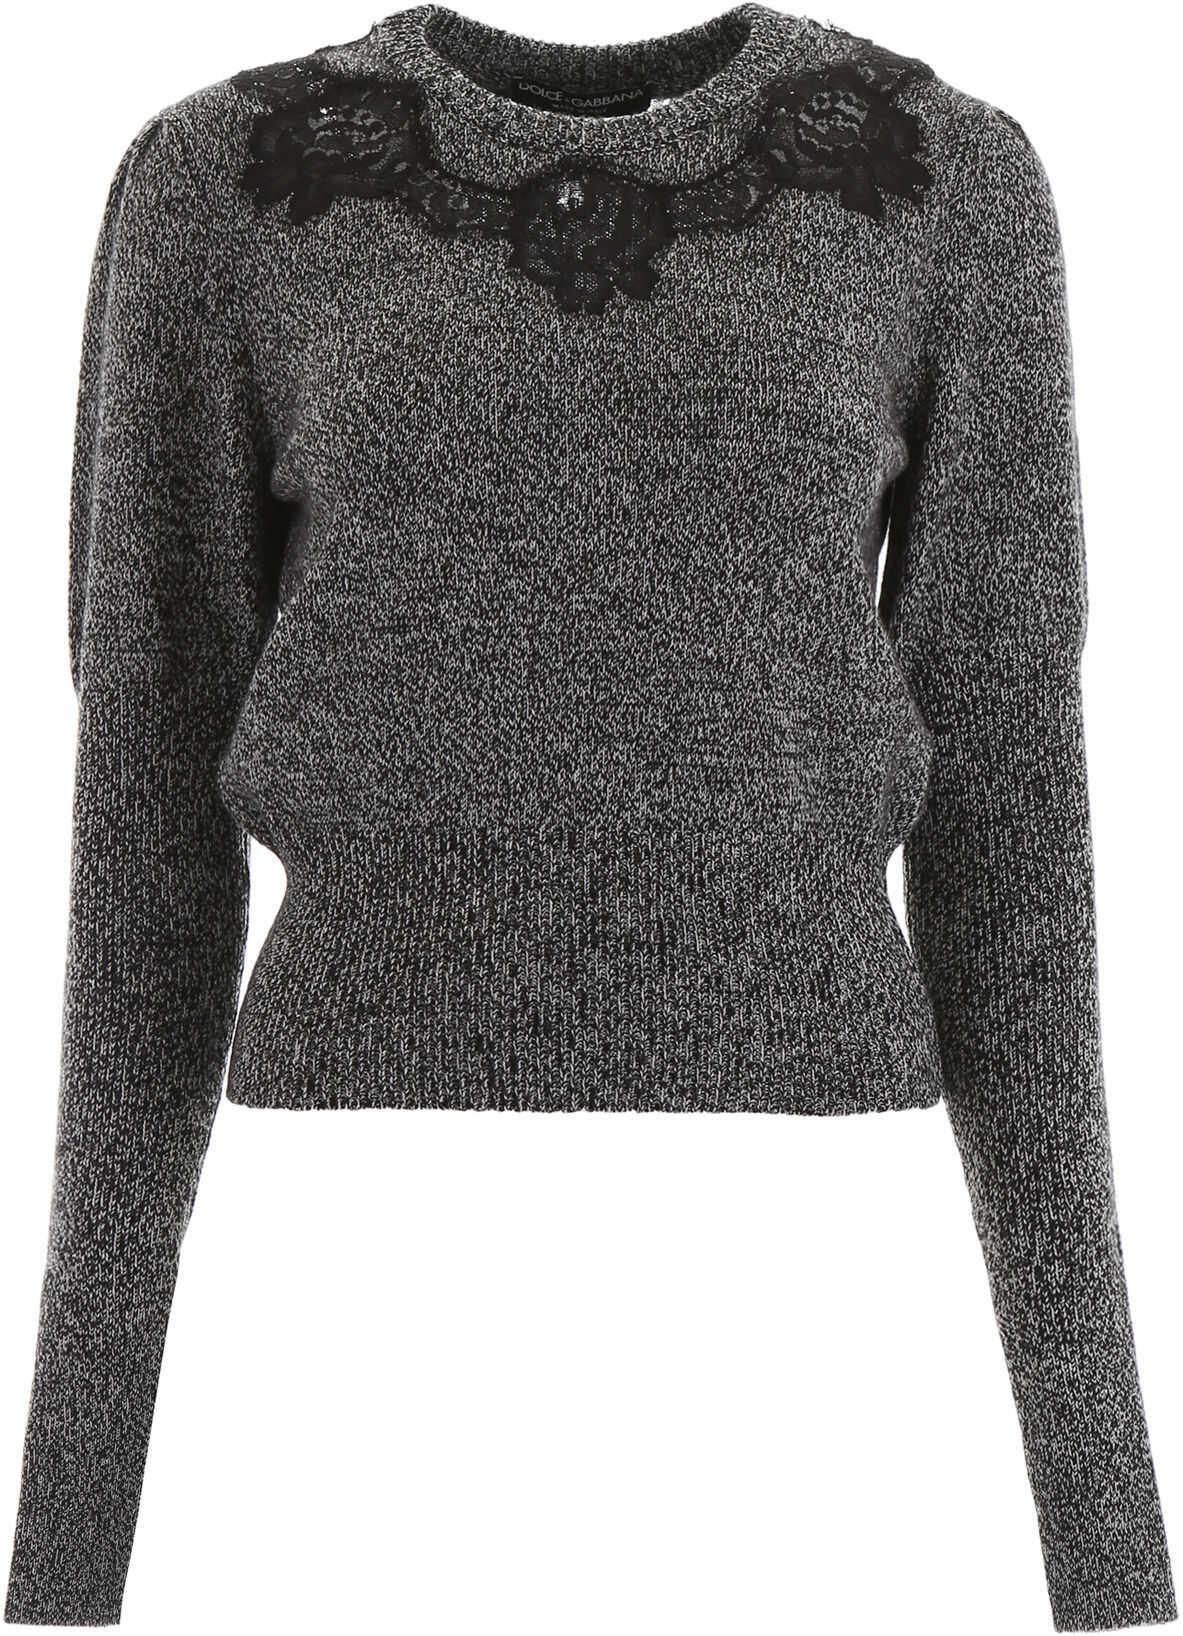 Dolce & Gabbana Pullover With Lace Inserts VARIANTE ABBINATA